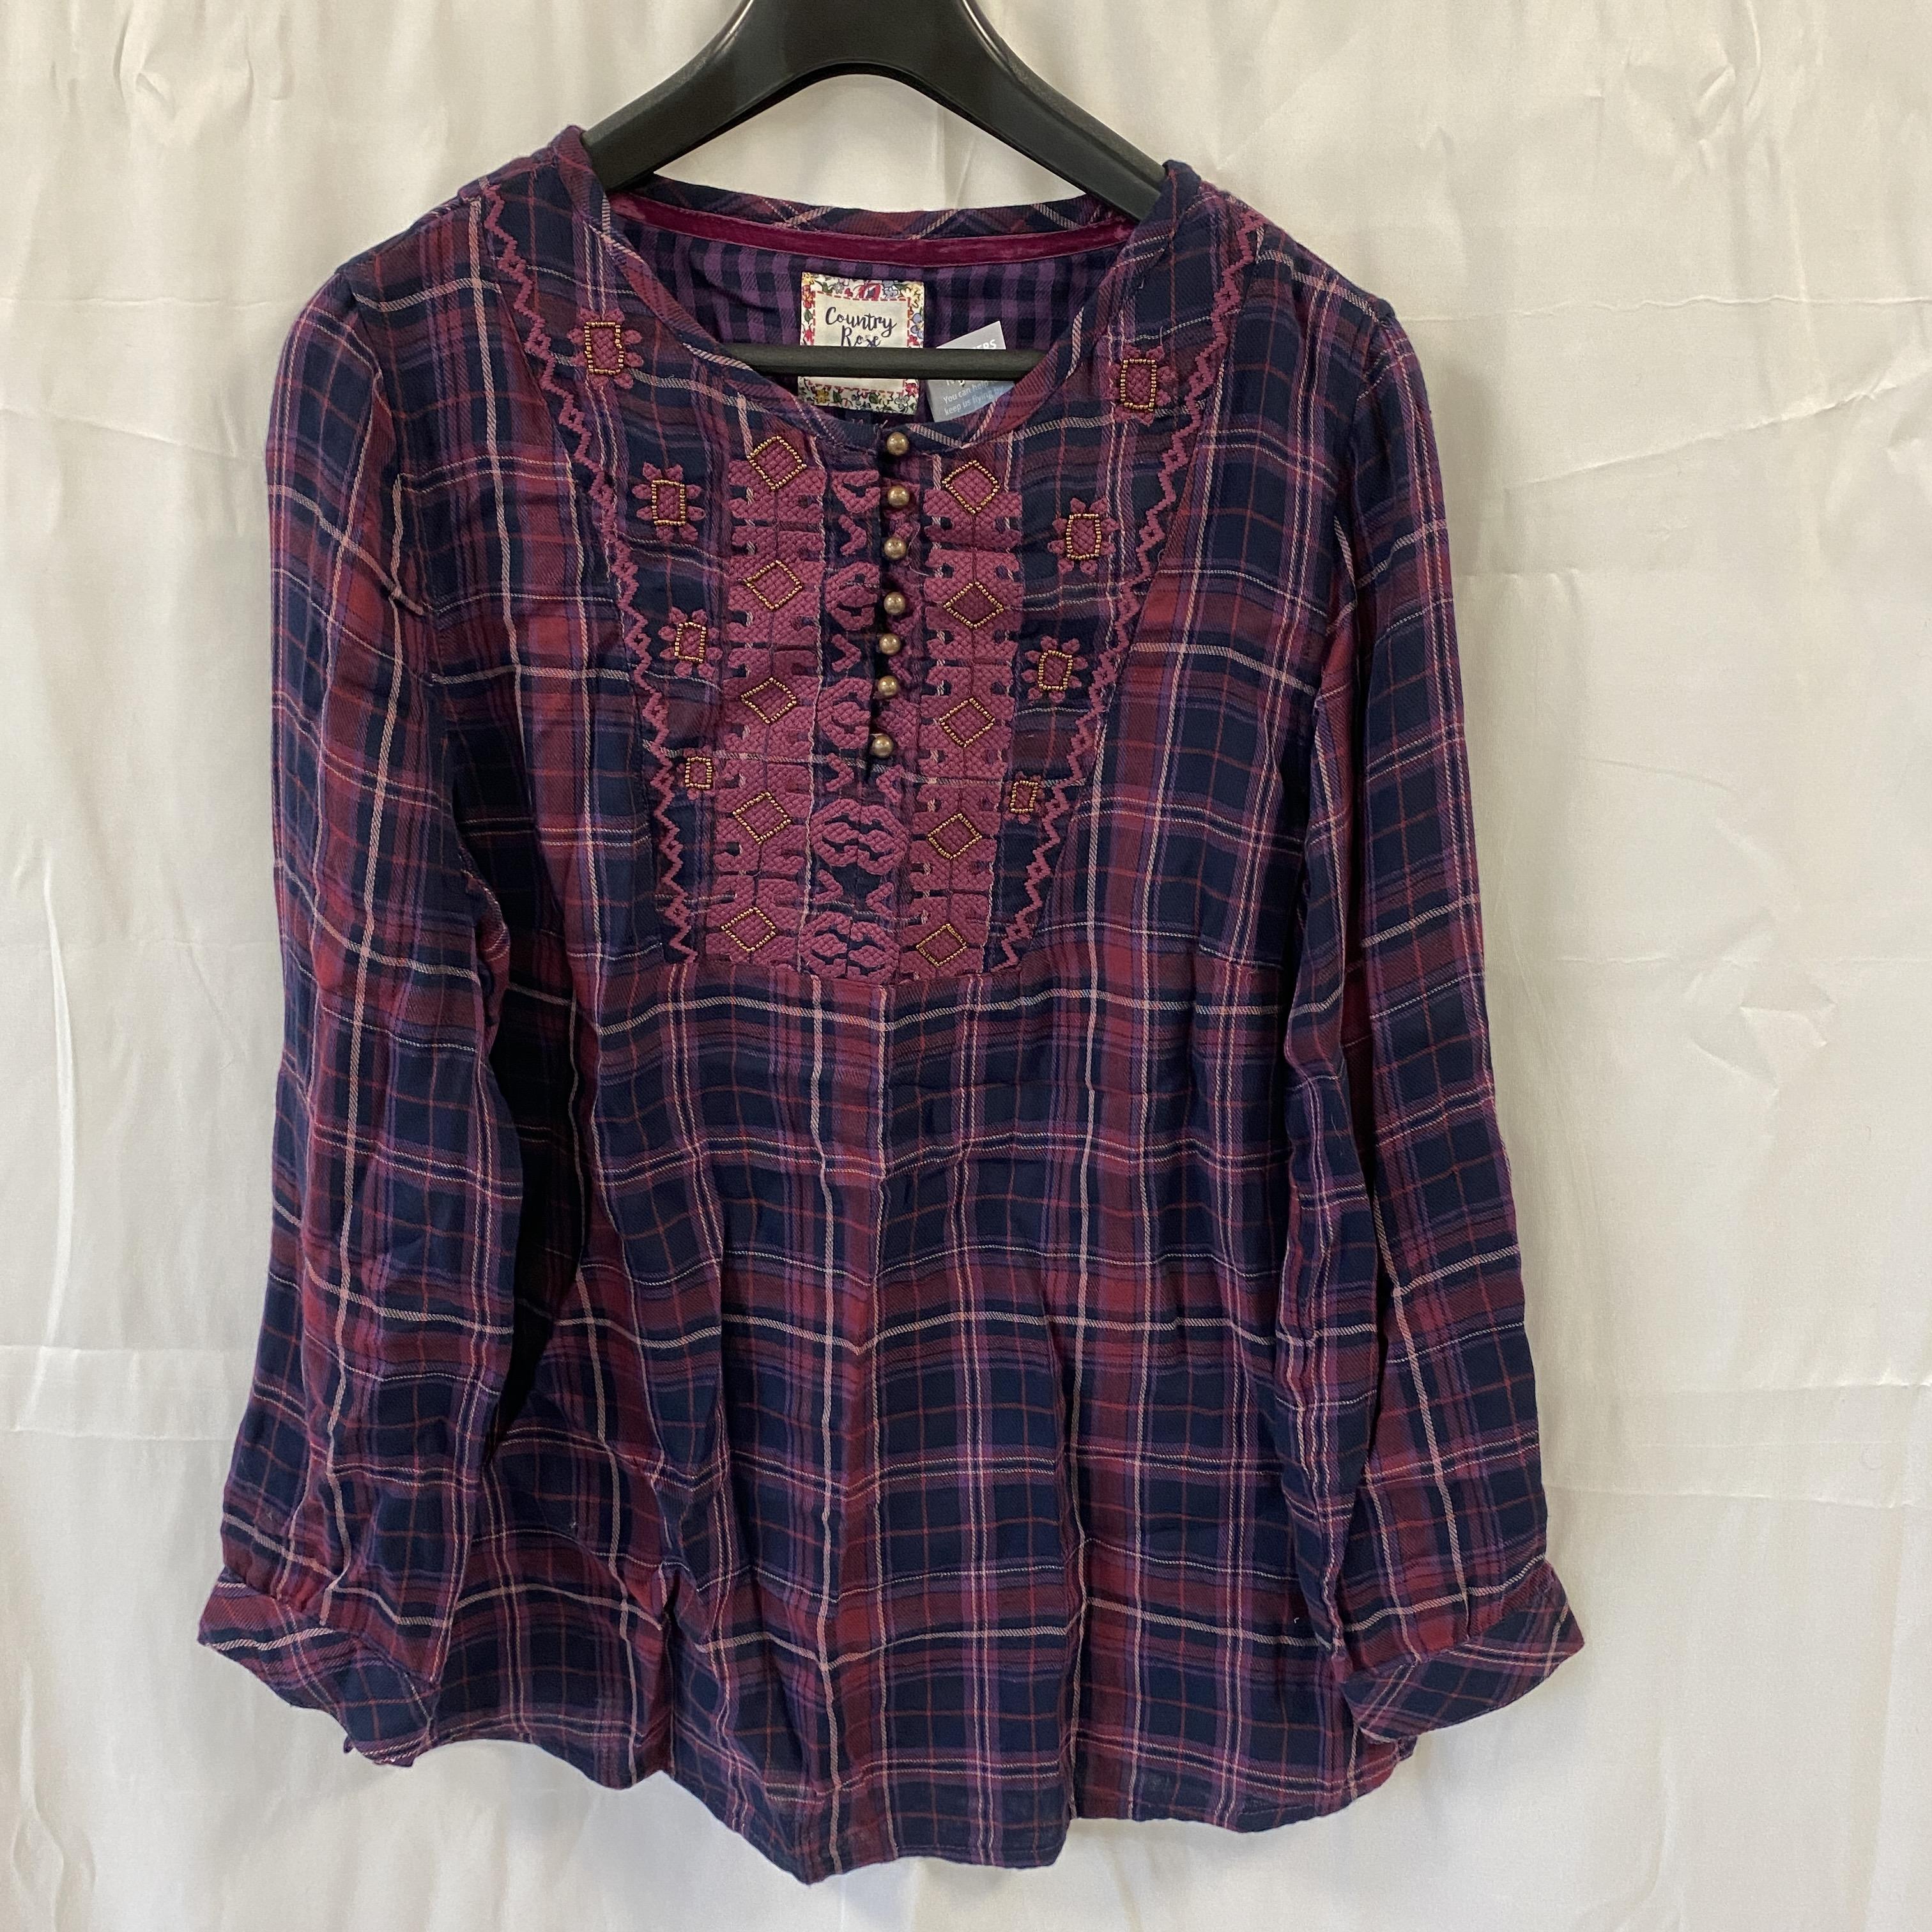 Country Rose Check Shirt